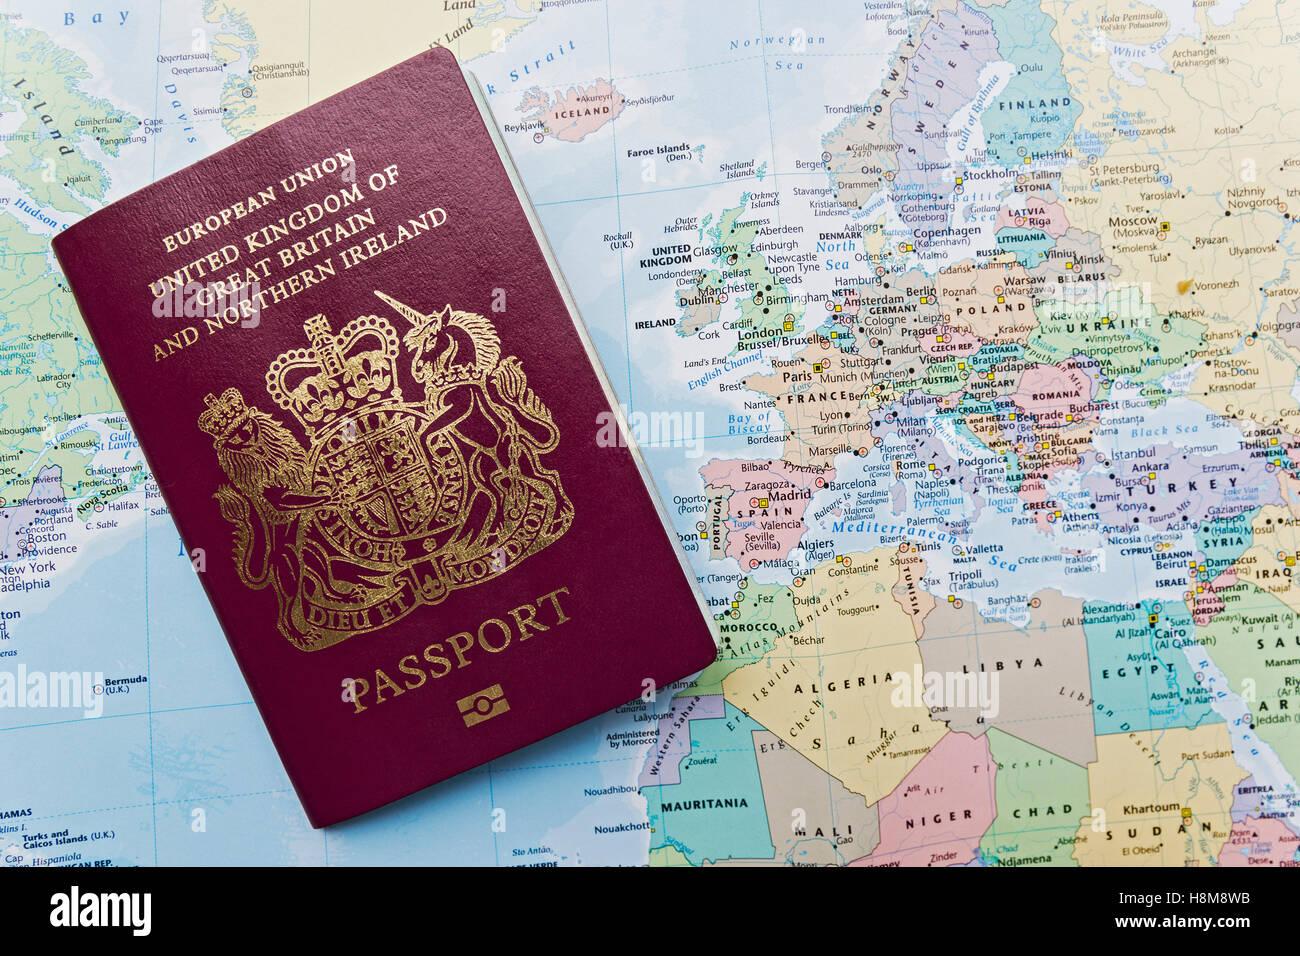 British passport of the european union on a world map with british passport of the european union on a world map with emphasis on europe gumiabroncs Choice Image